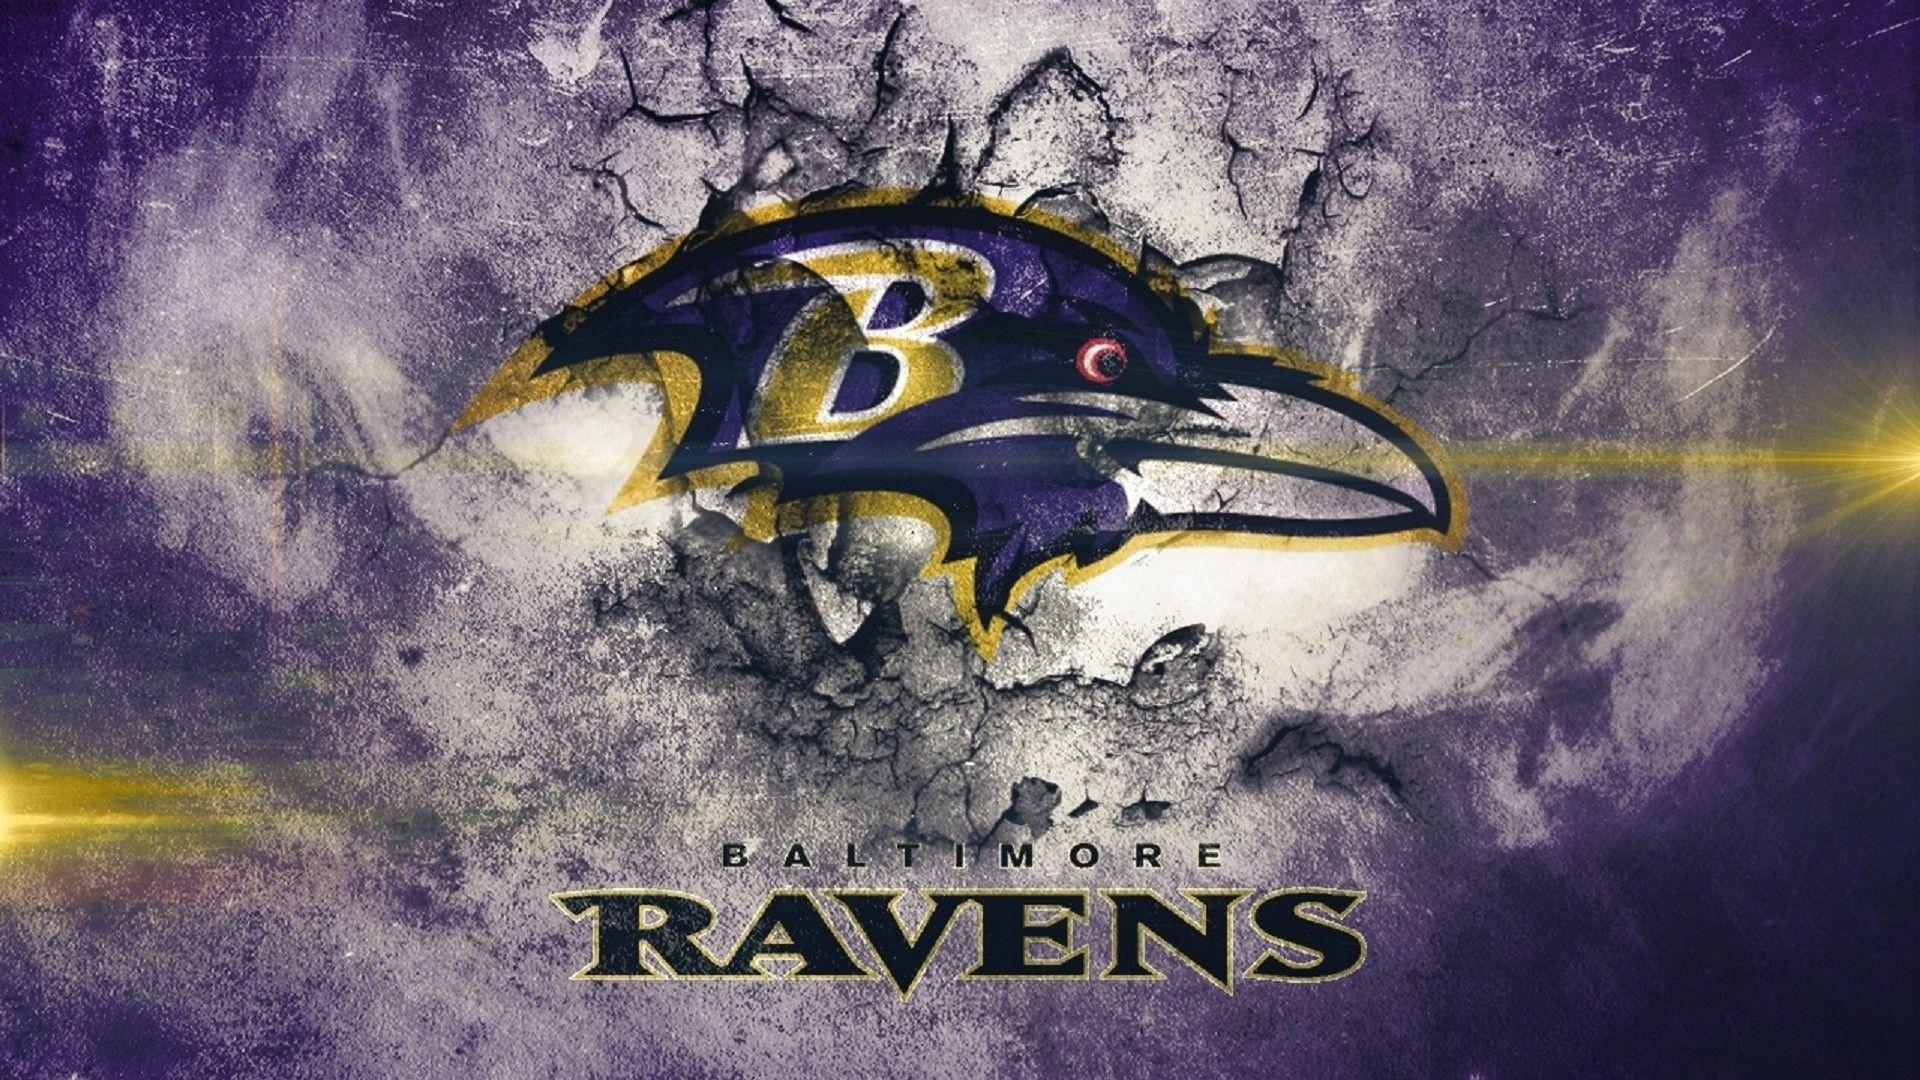 Wallpaper Ravens in 2020 Baltimore ravens logo